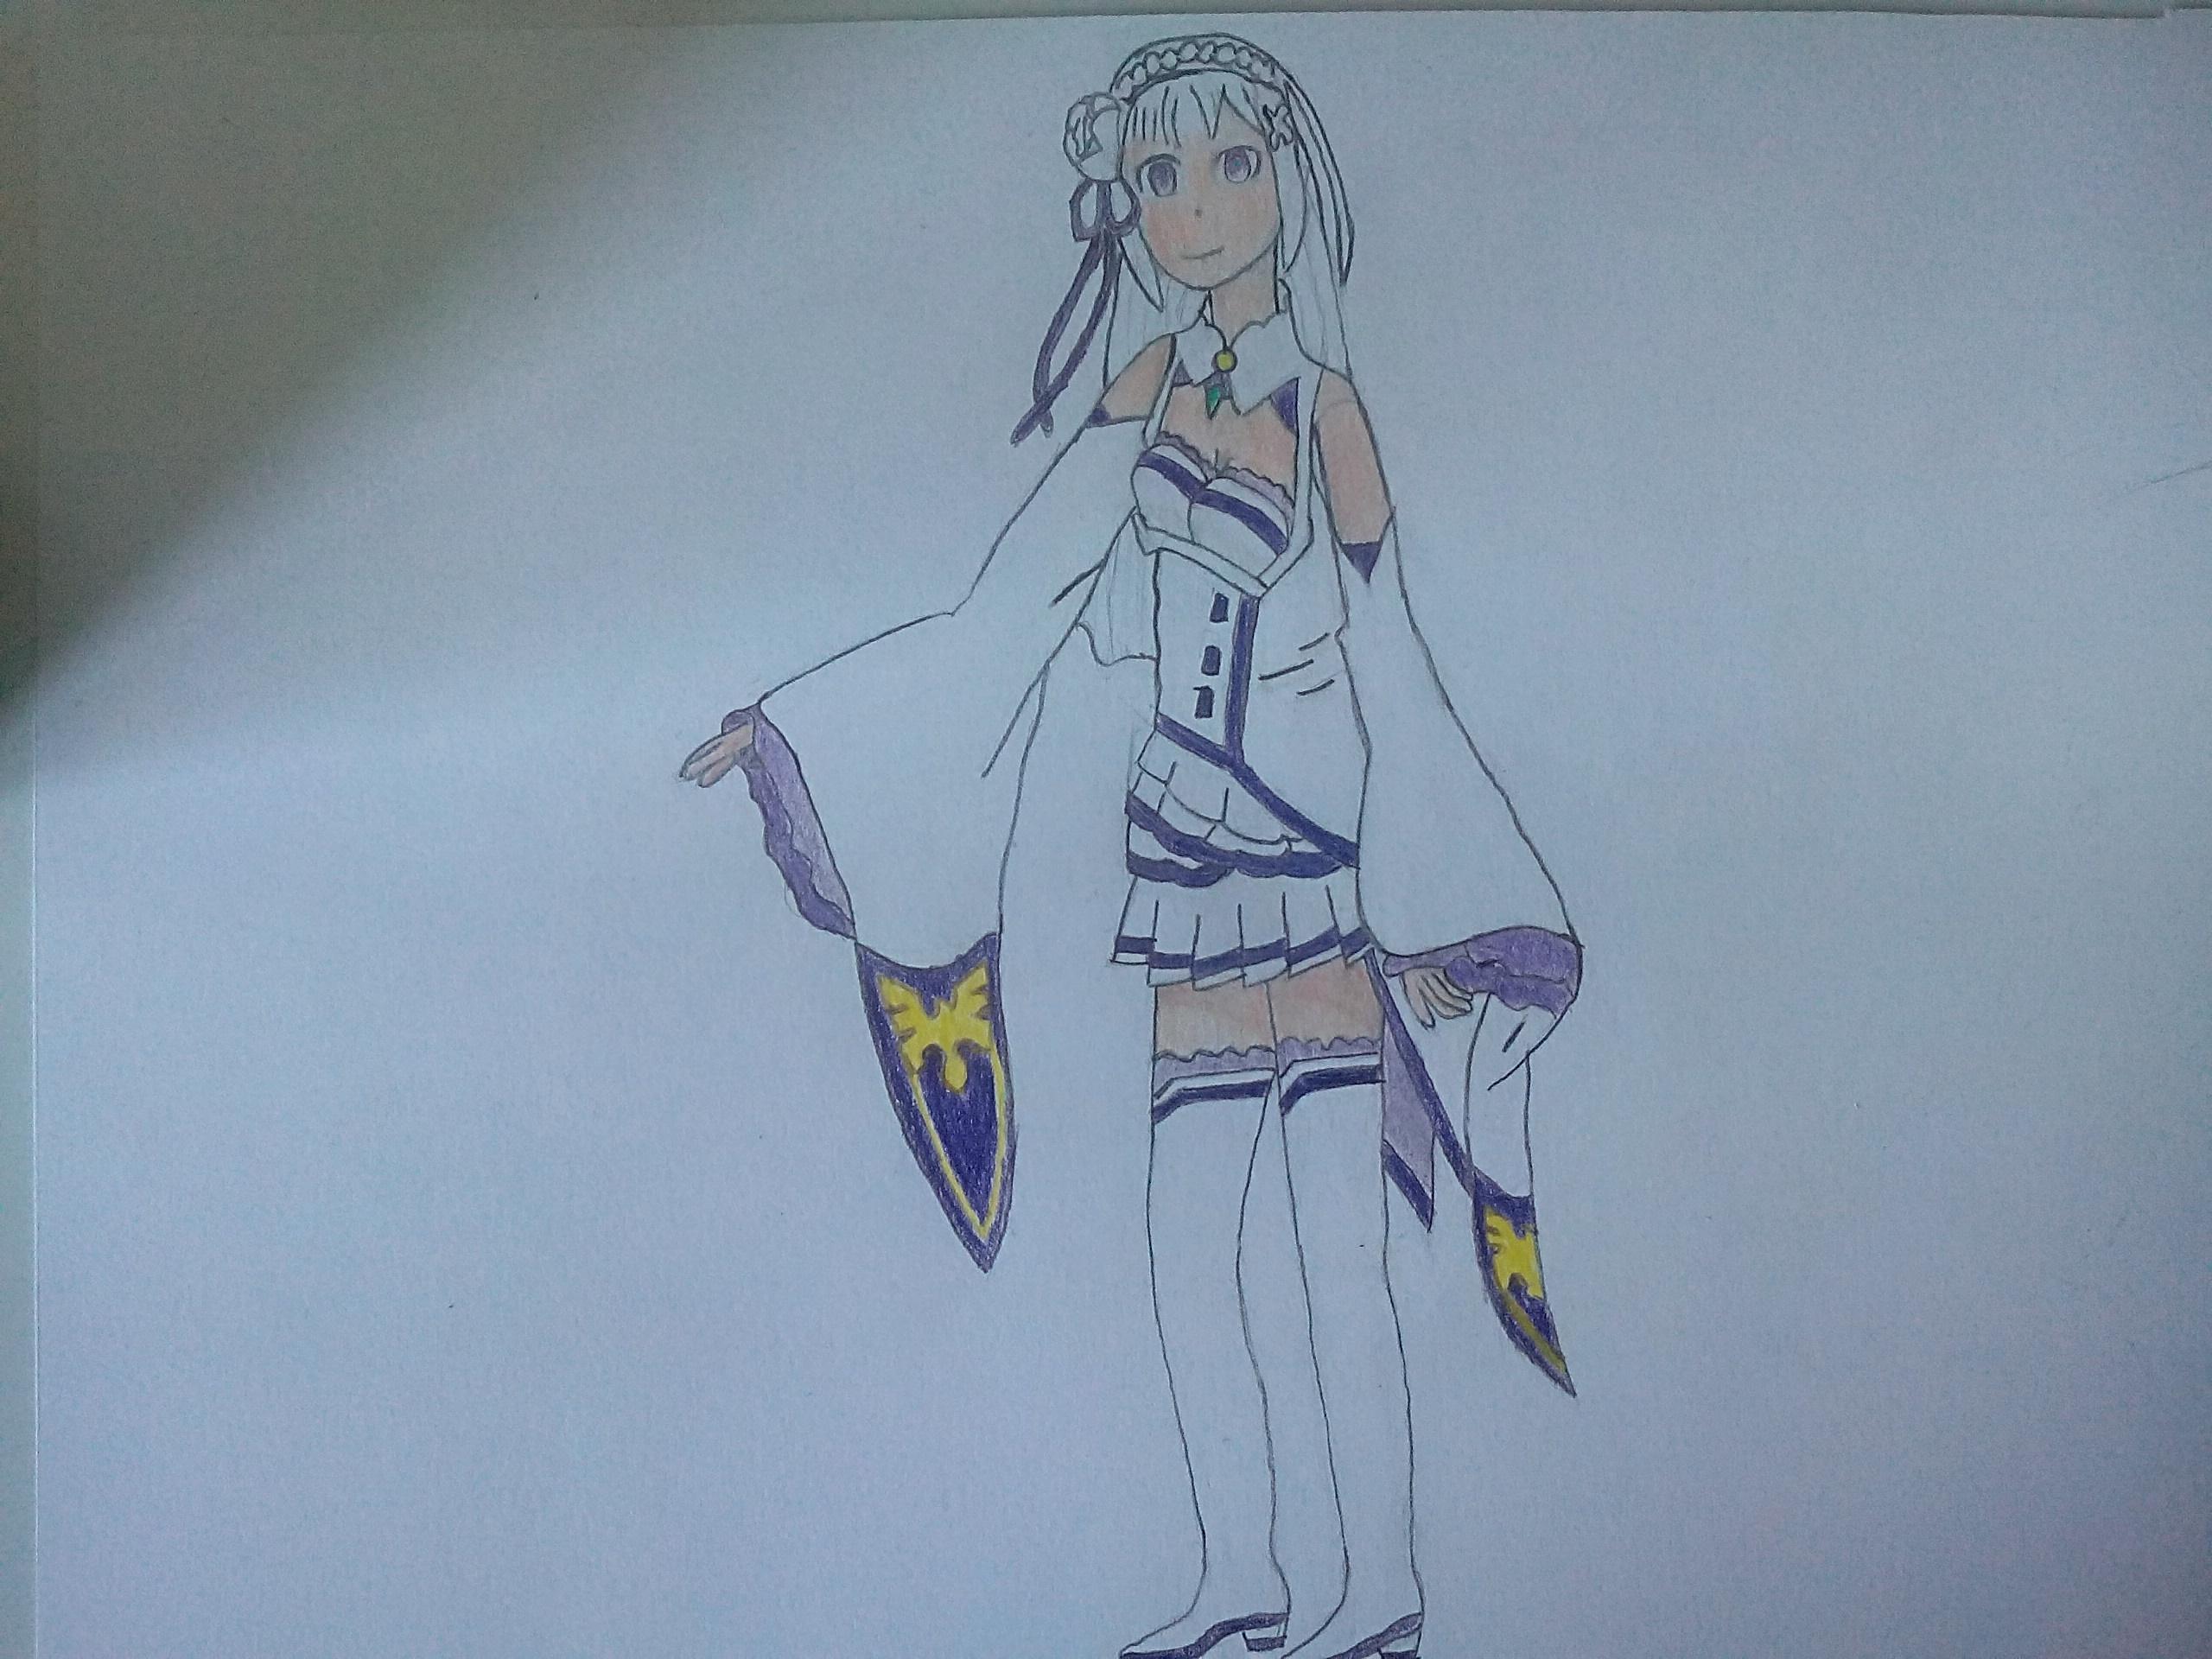 Line Art Zero : Emilia re zero by ramog on deviantart